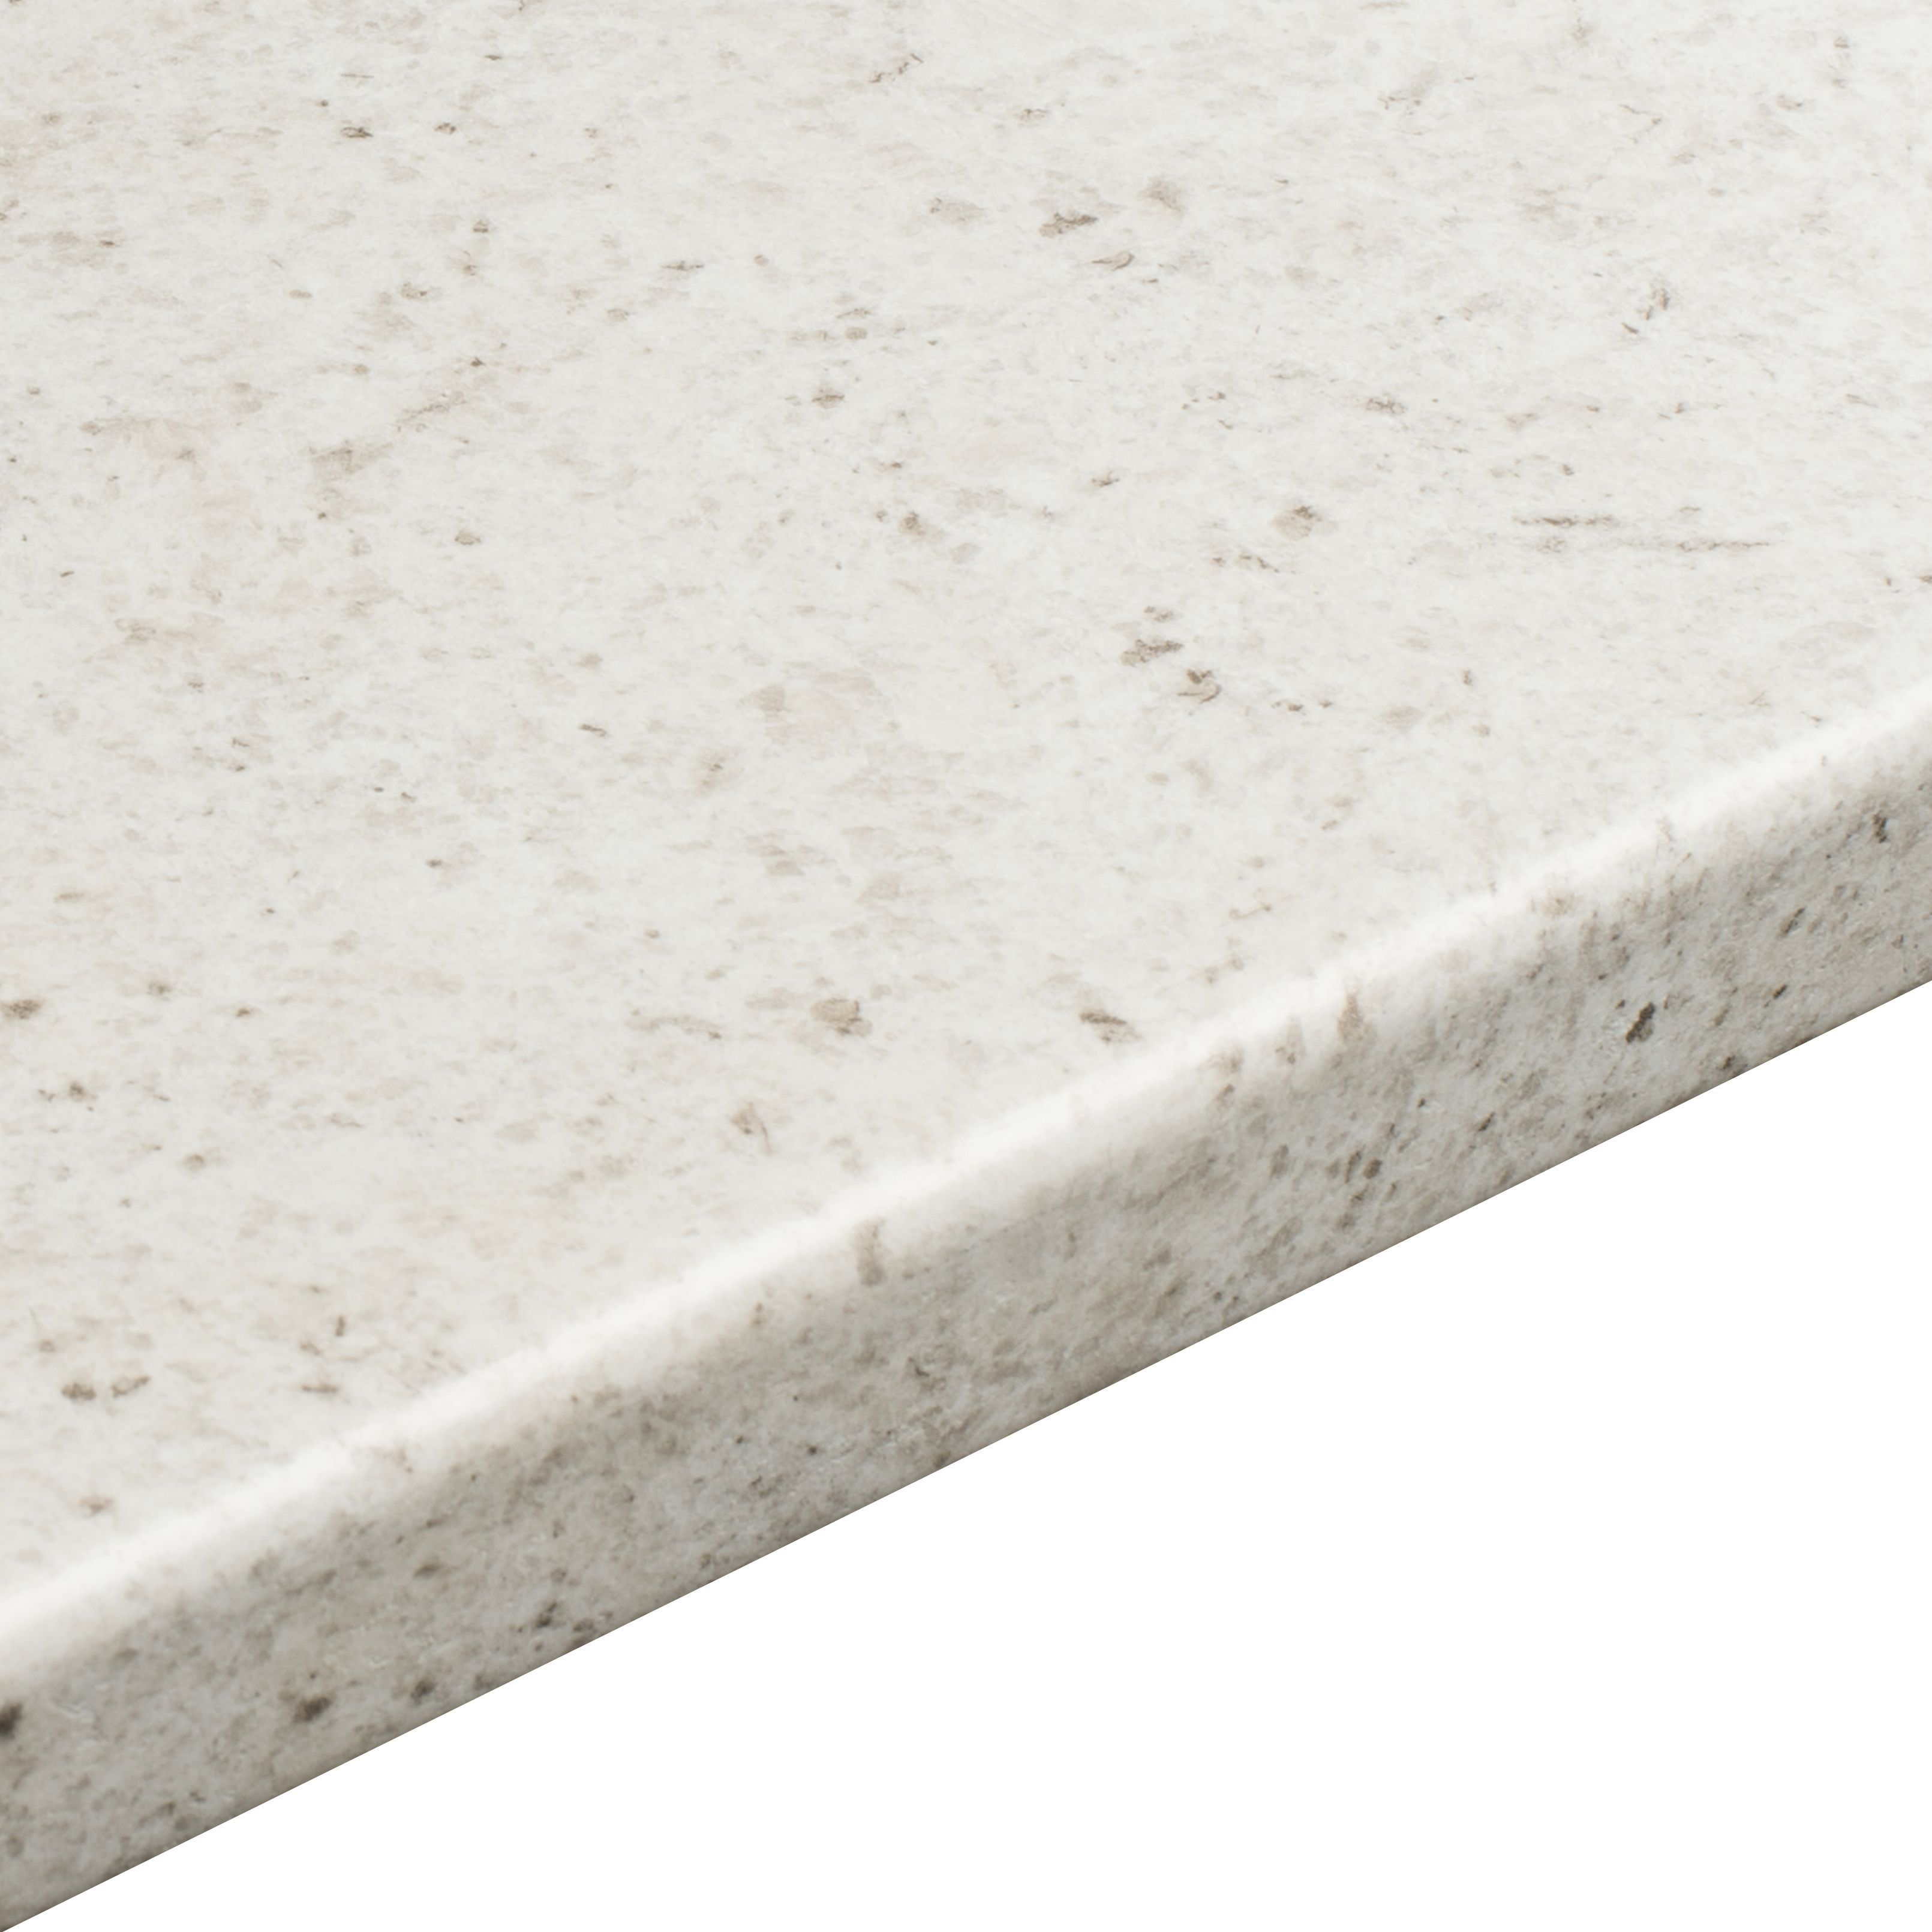 38mm B&Q White Cashmere Etched Laminate Round Edge Kitchen